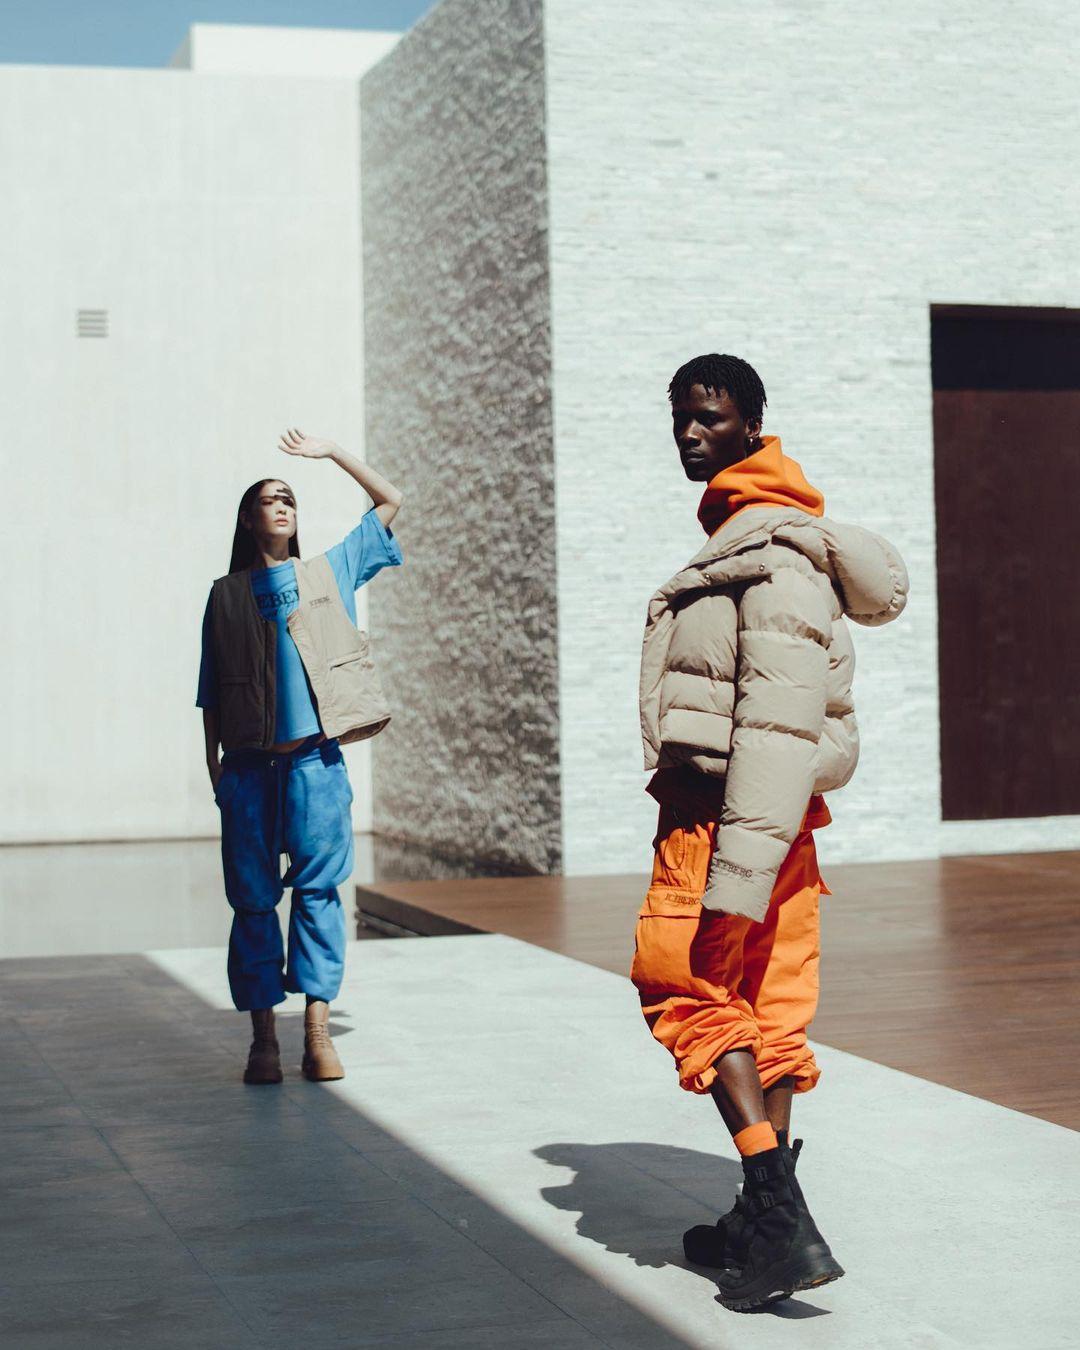 Kailand Morris, Iceberg, Celestine Agency, Leibi Carias